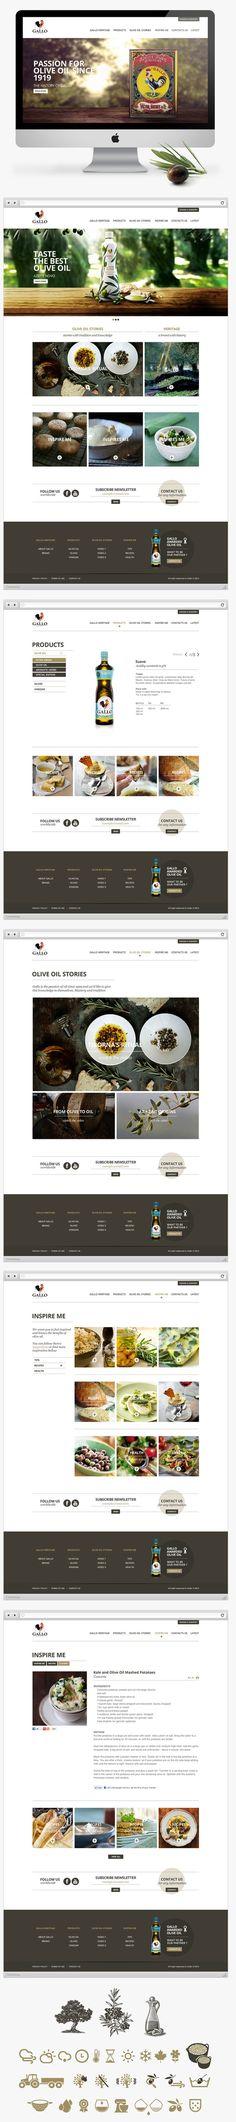 Creative #Hotel #Restaurant #Webdesign | #webdesign #it #web #design #layout #userinterface #website #webdesign <<< repinned by an #advertising #agency from #Hamburg / #Germany - www.BlickeDeeler.de | Follow us on www.facebook.com/BlickeDeeler